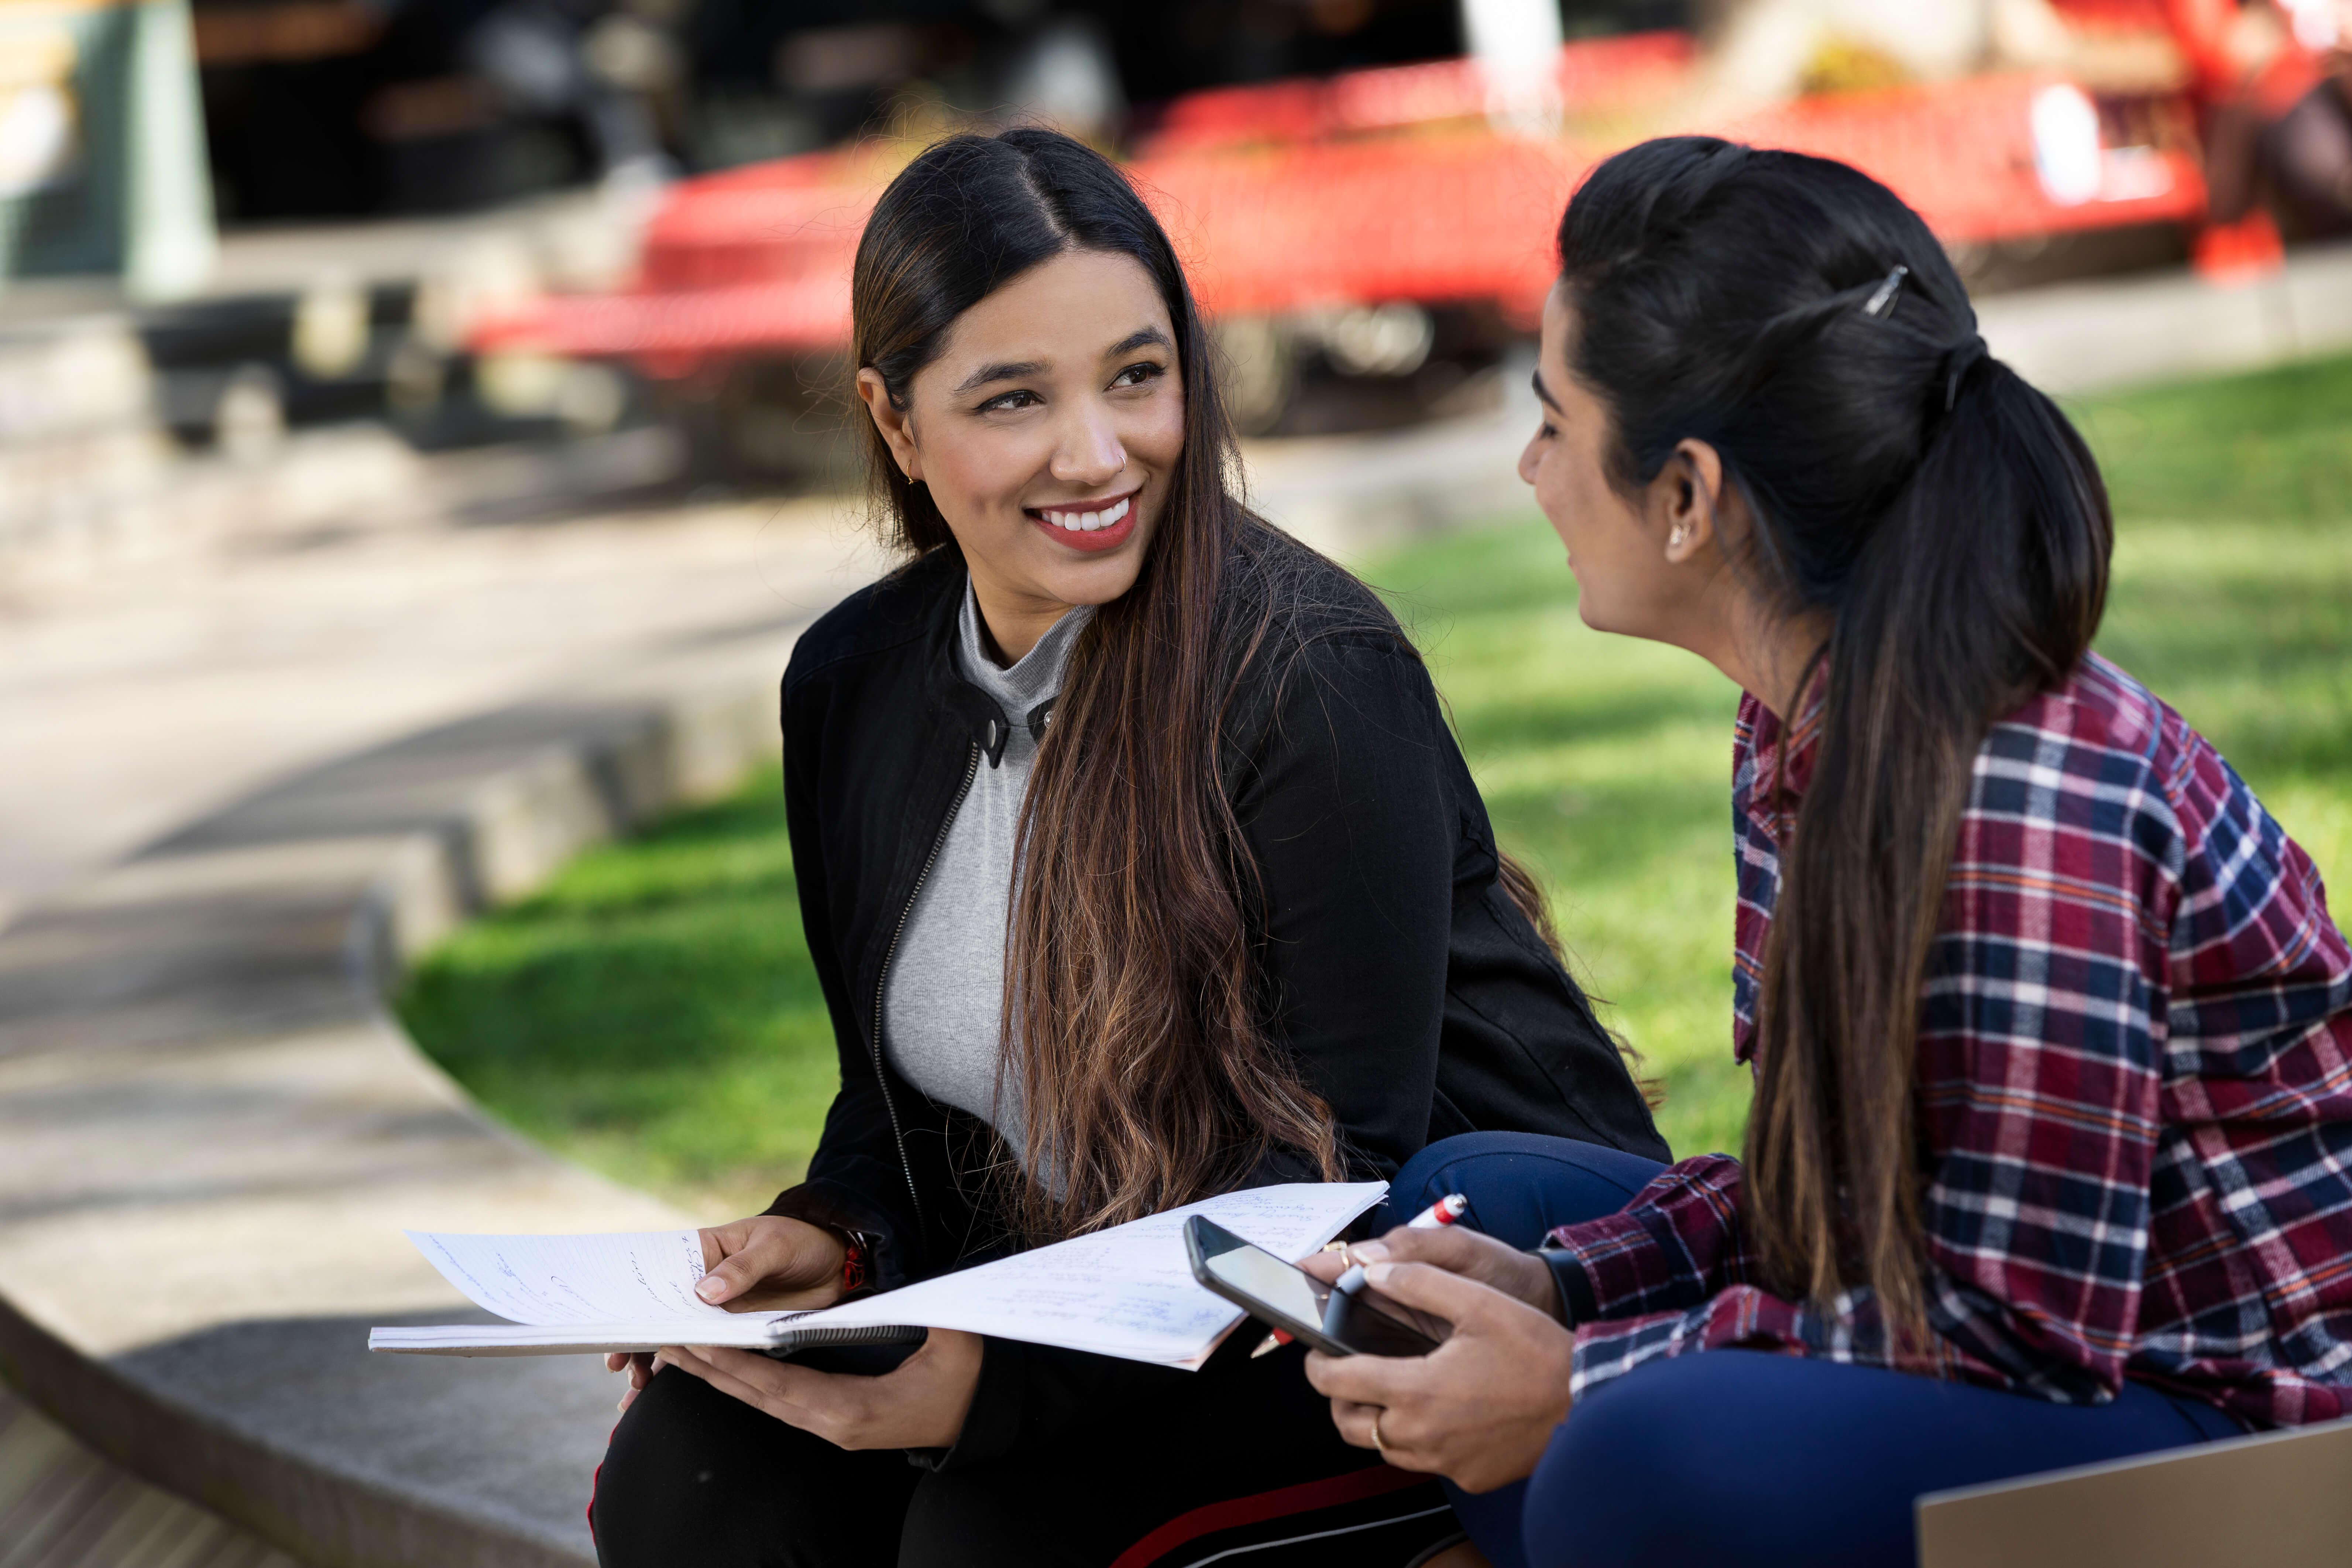 La Trobe University: A world-class education, wherever you are